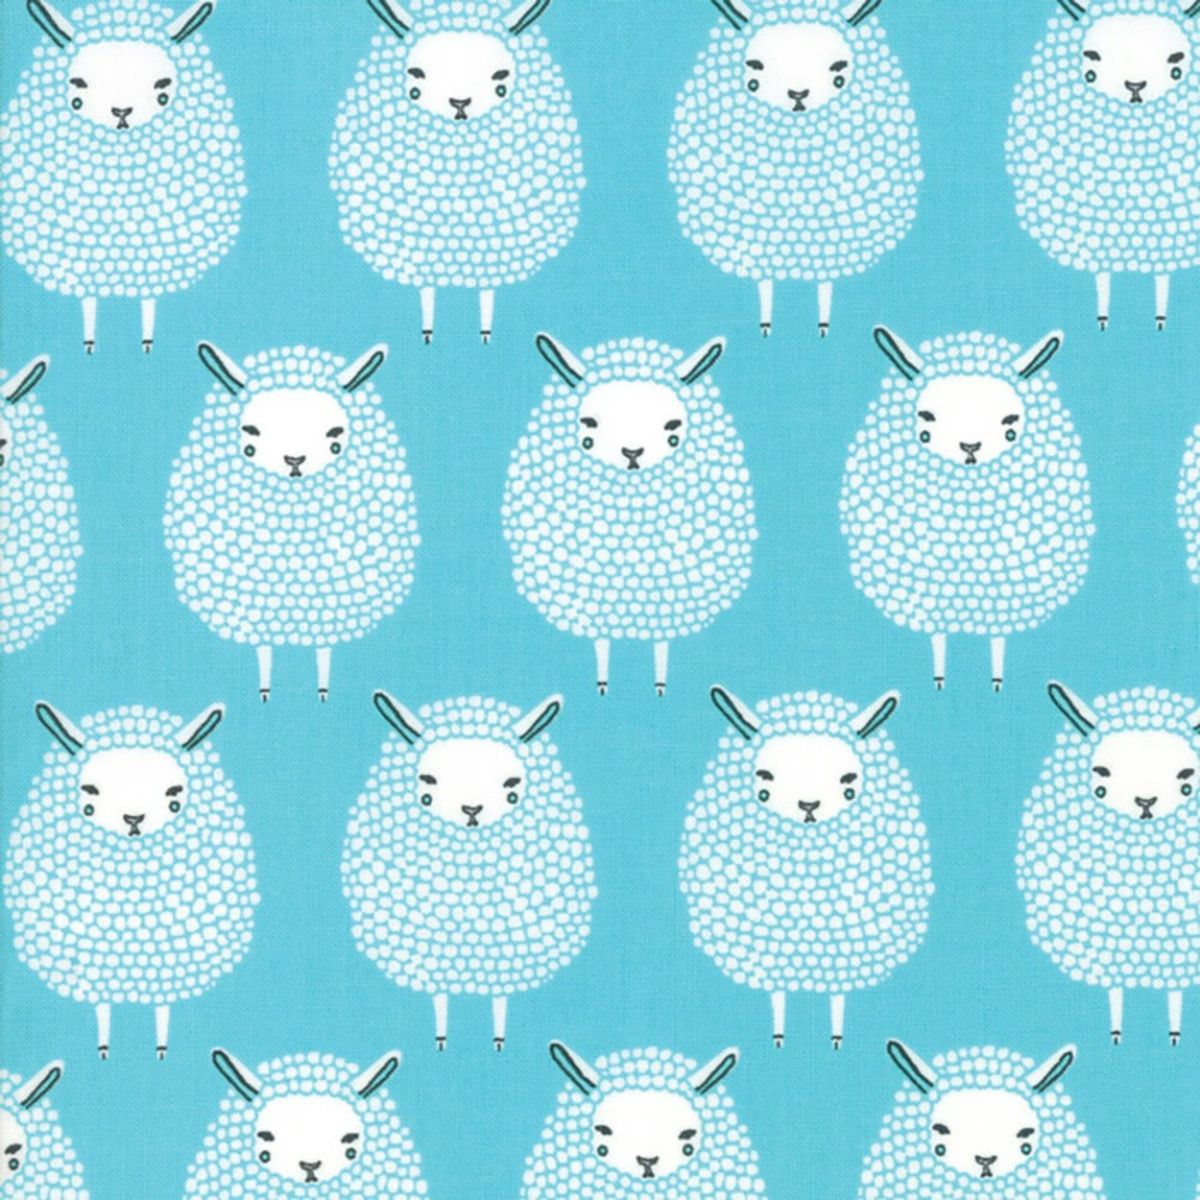 Let Them Be Little 53 Panel Black Riley Blake Cotton Fabric